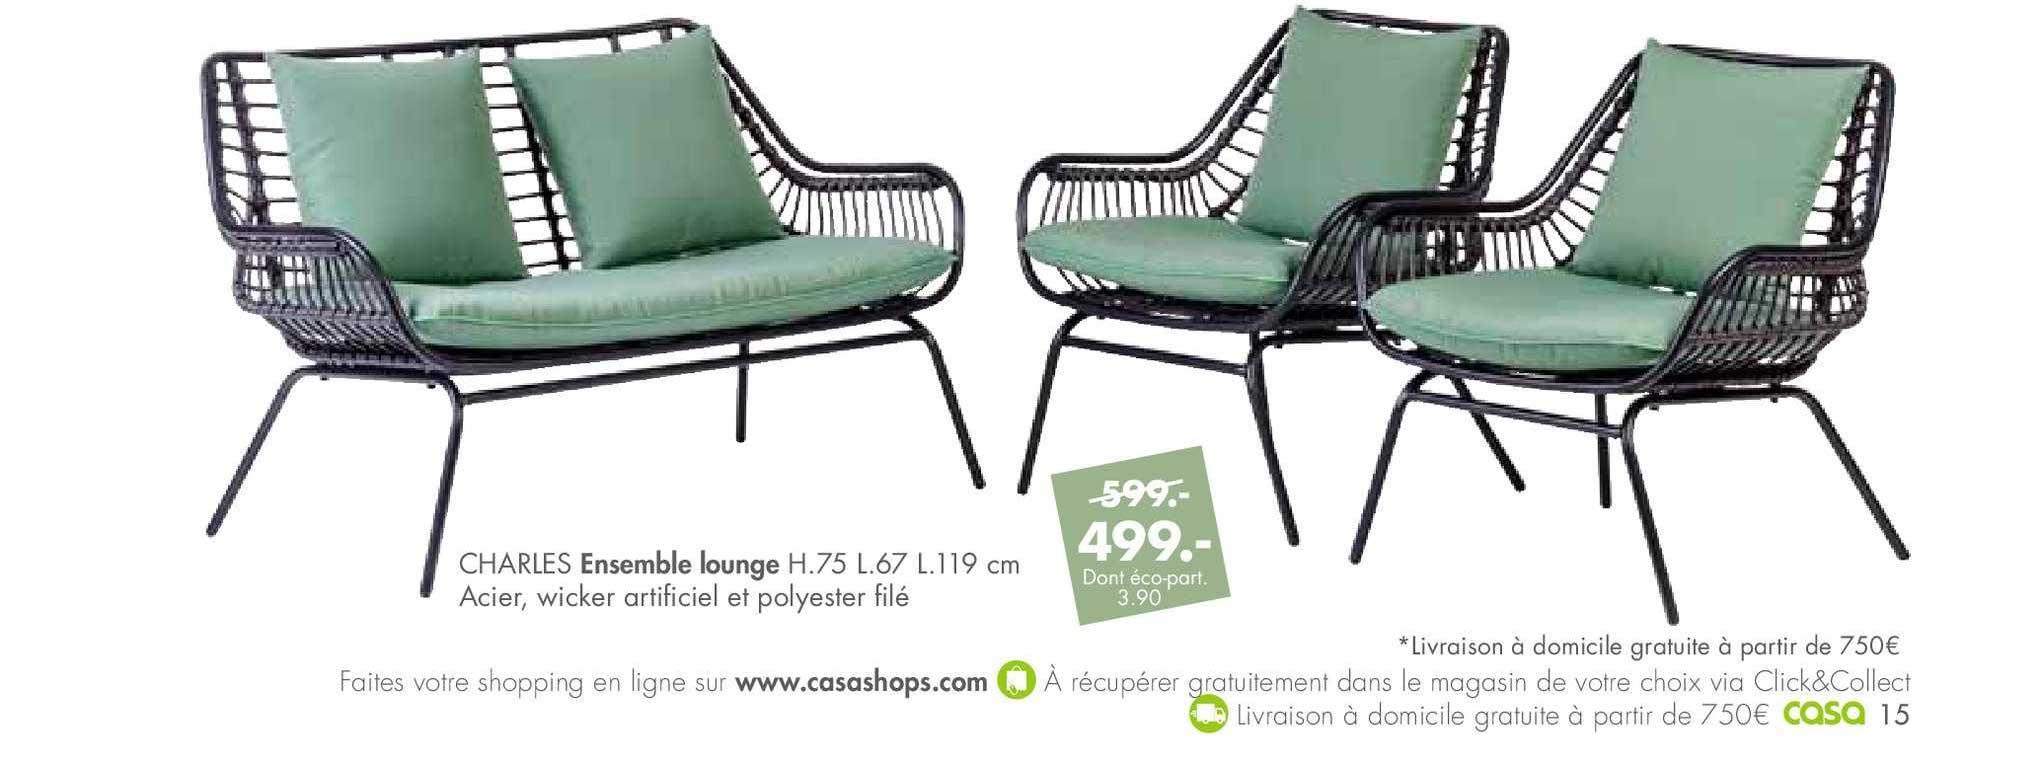 Casa Ensemble Lounge Charles